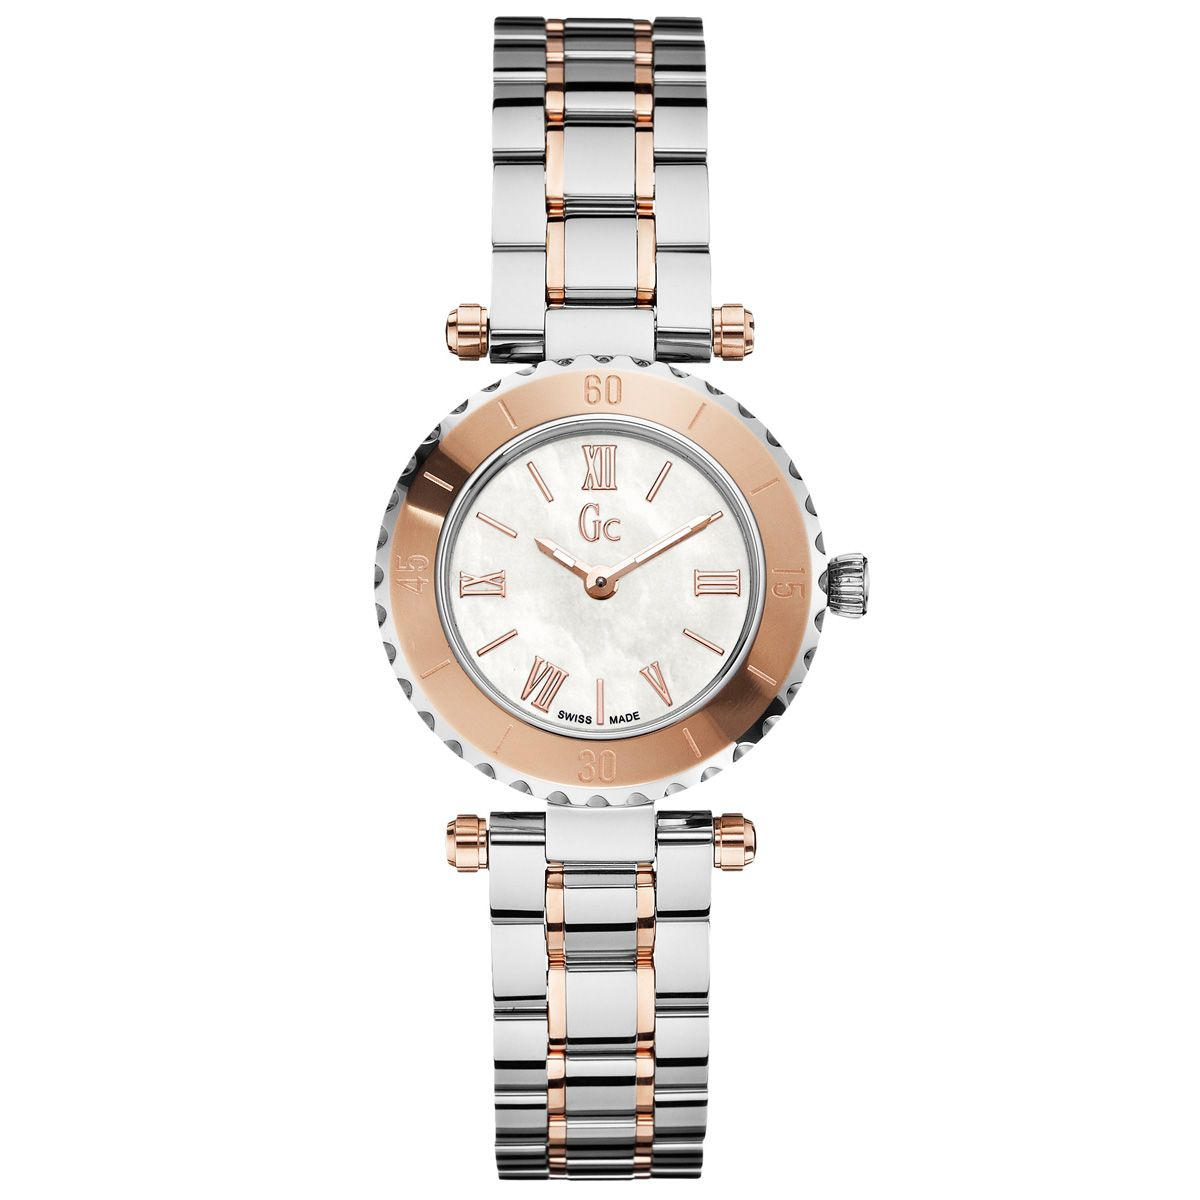 Gc Gcx70027l1s Bayan Kol Saati Saat Ve Saat Fashion Watches Womens Watches Watches